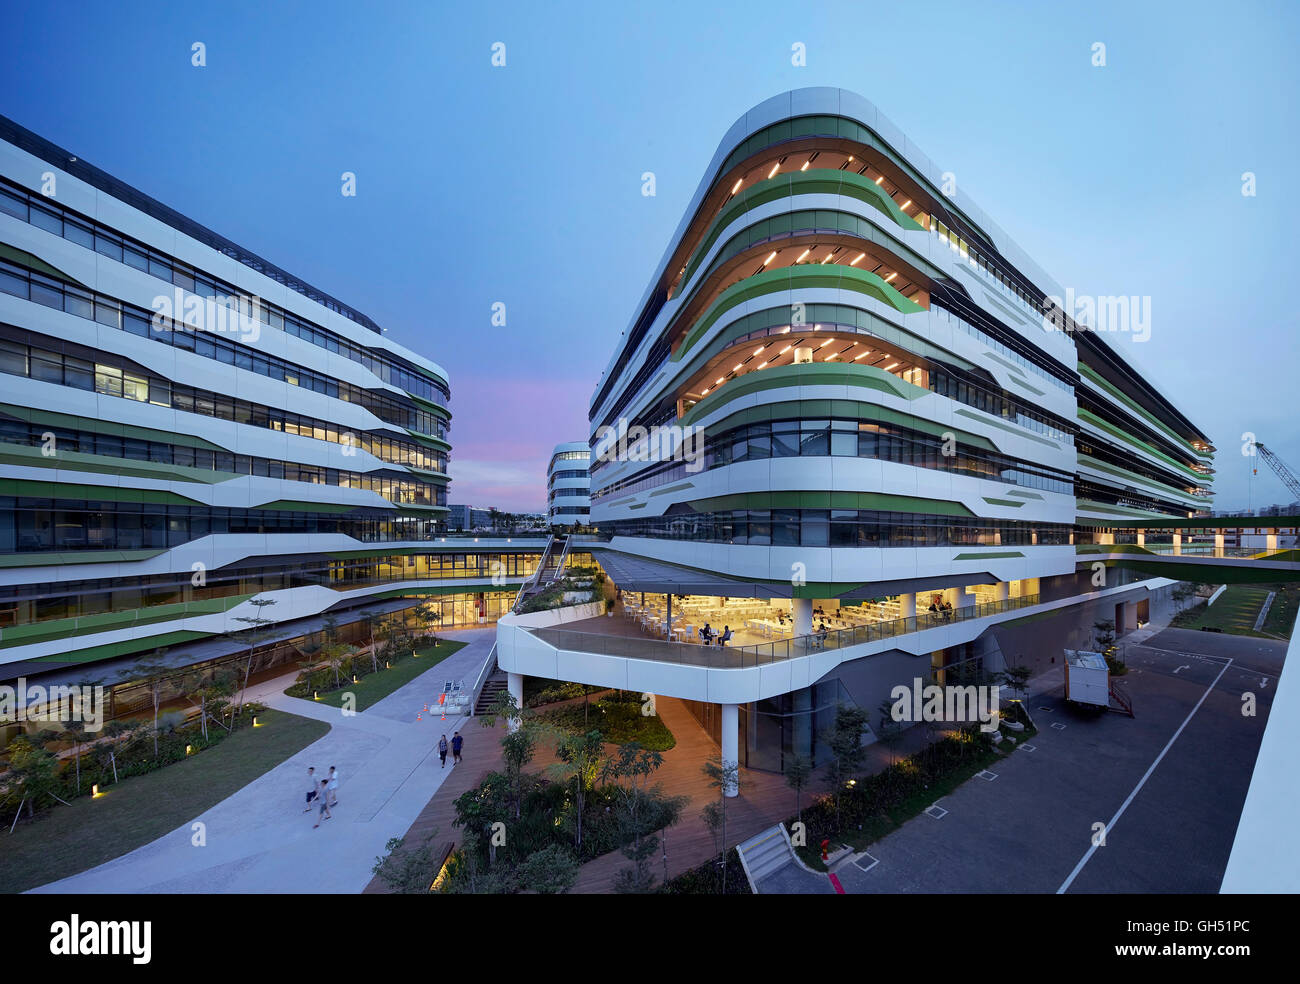 View Across Campus With Lit Interiors Singapore University Of Stock - Lit design 2015